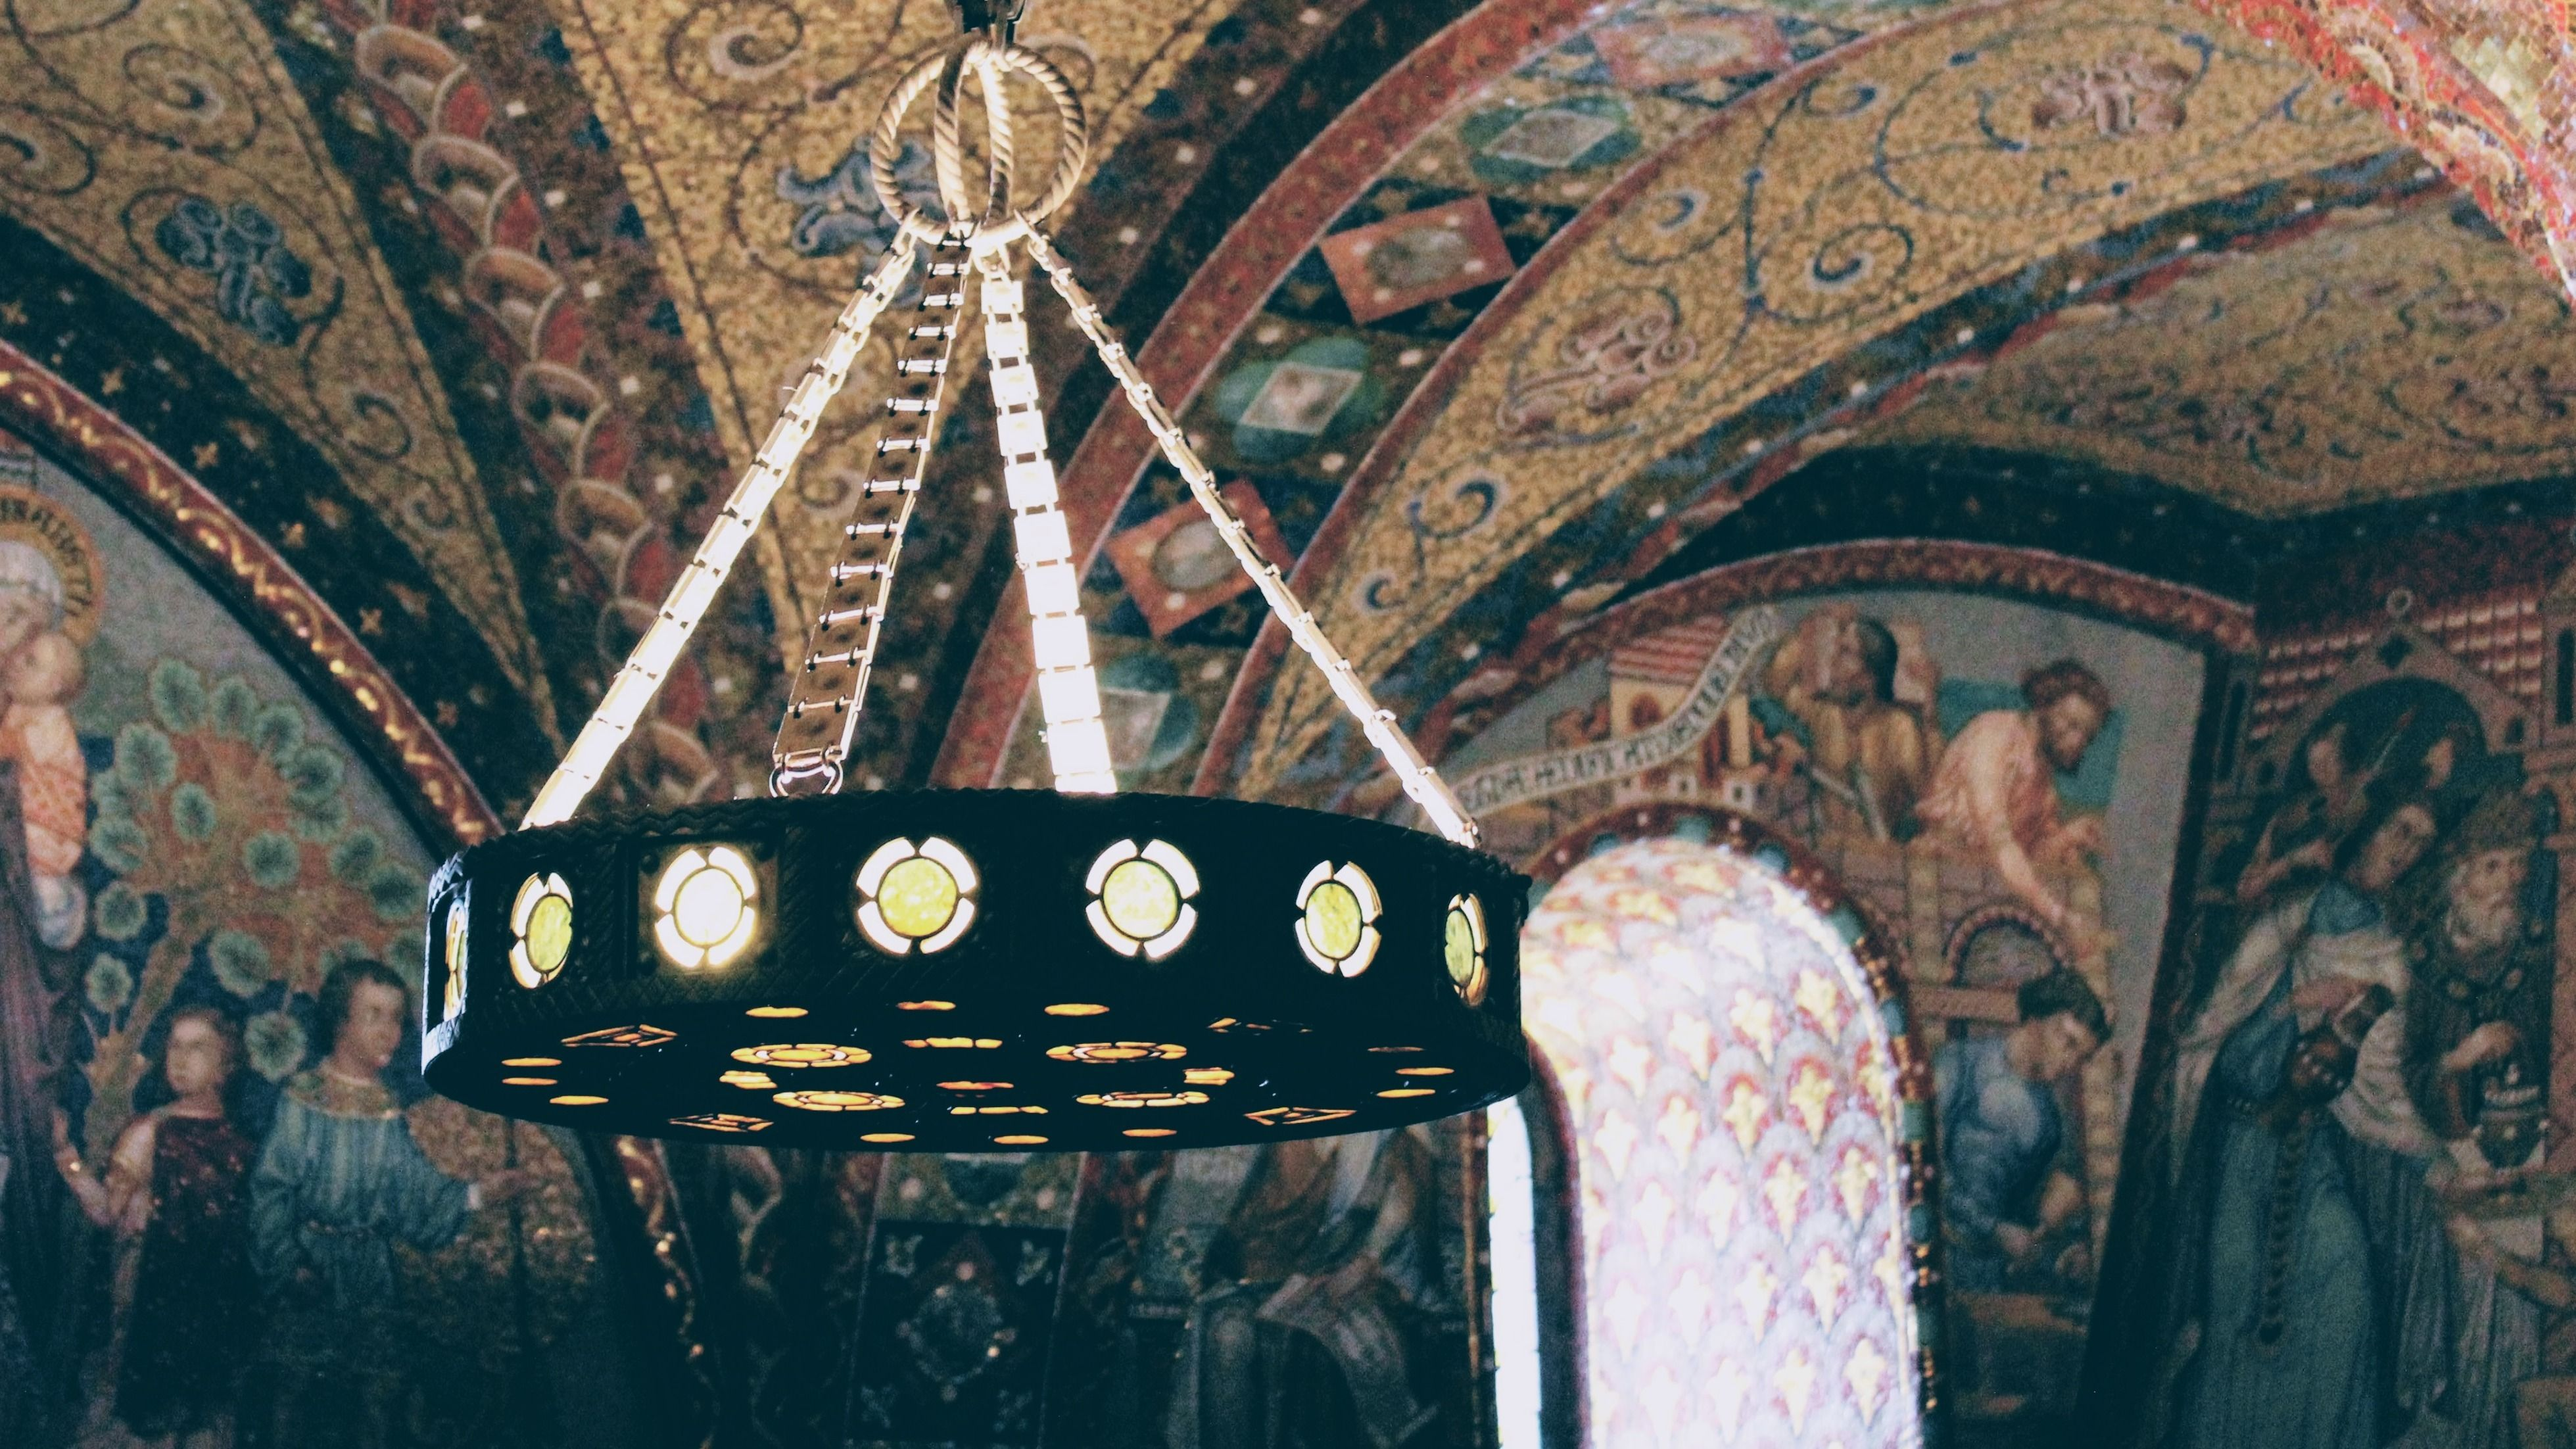 Columbus Interfaith Group